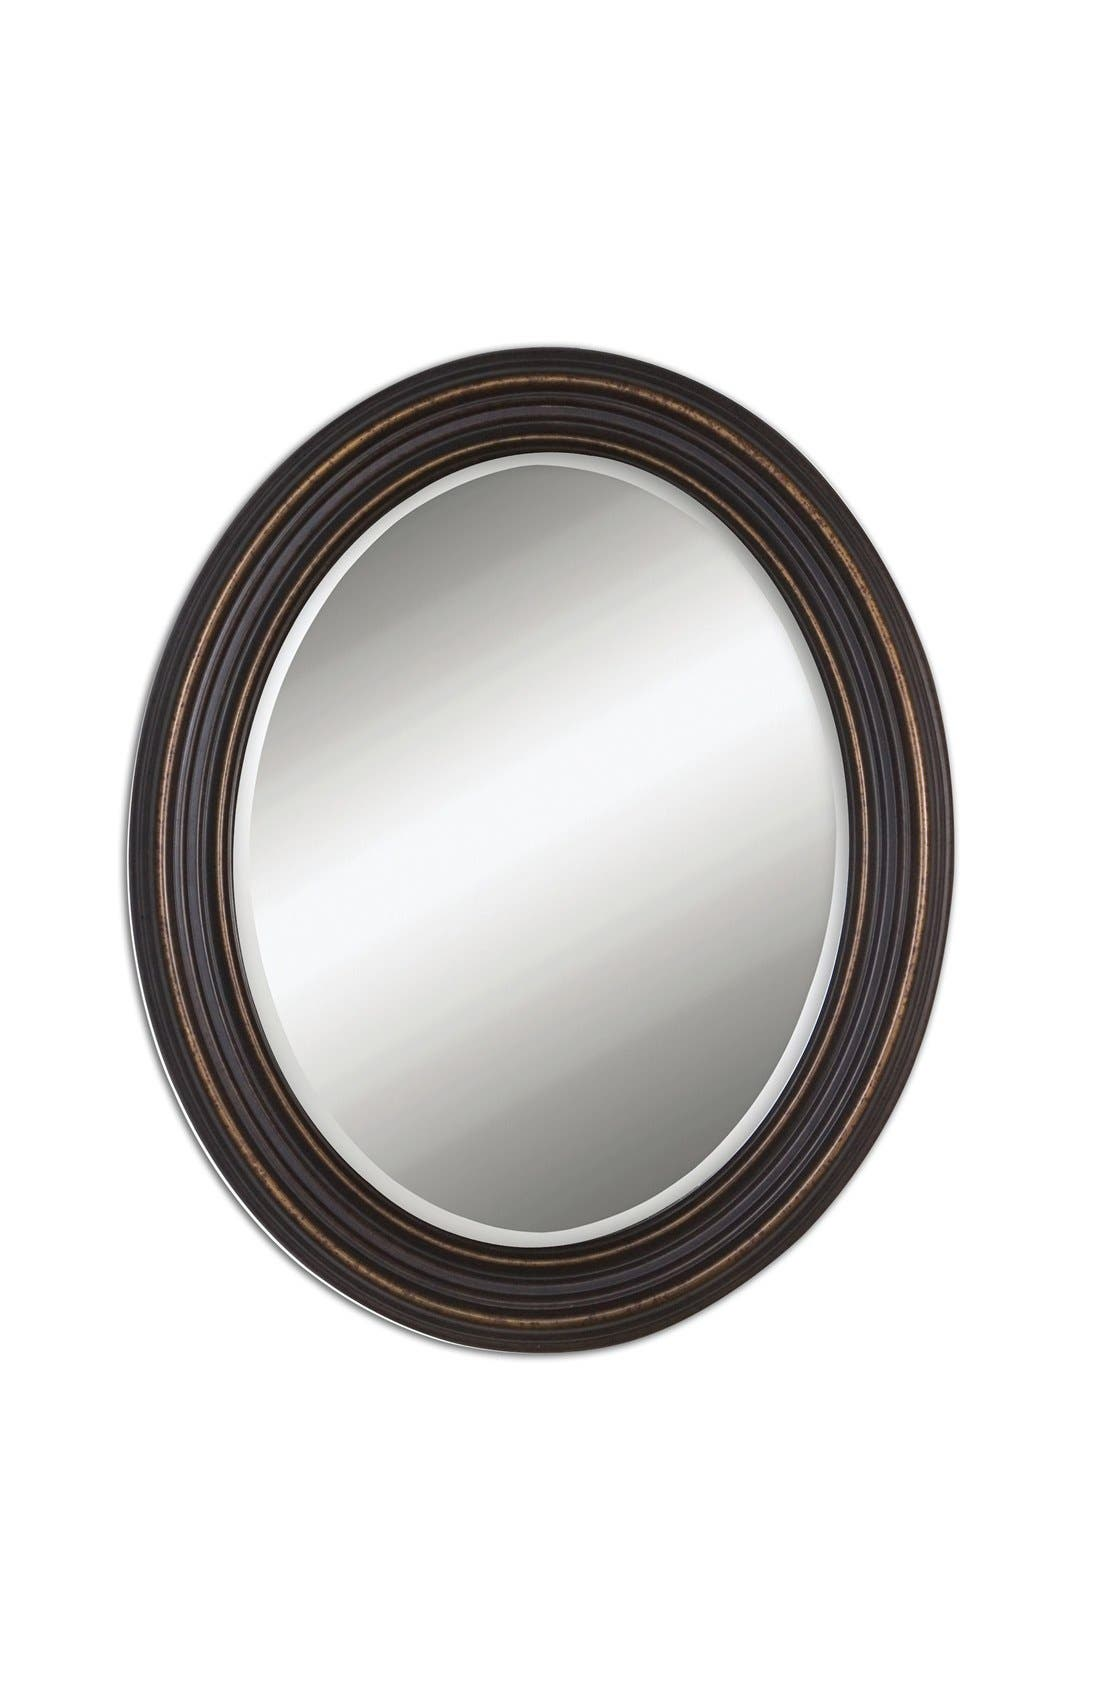 Main Image - Uttermost 'Ovesca' Oval Mirror